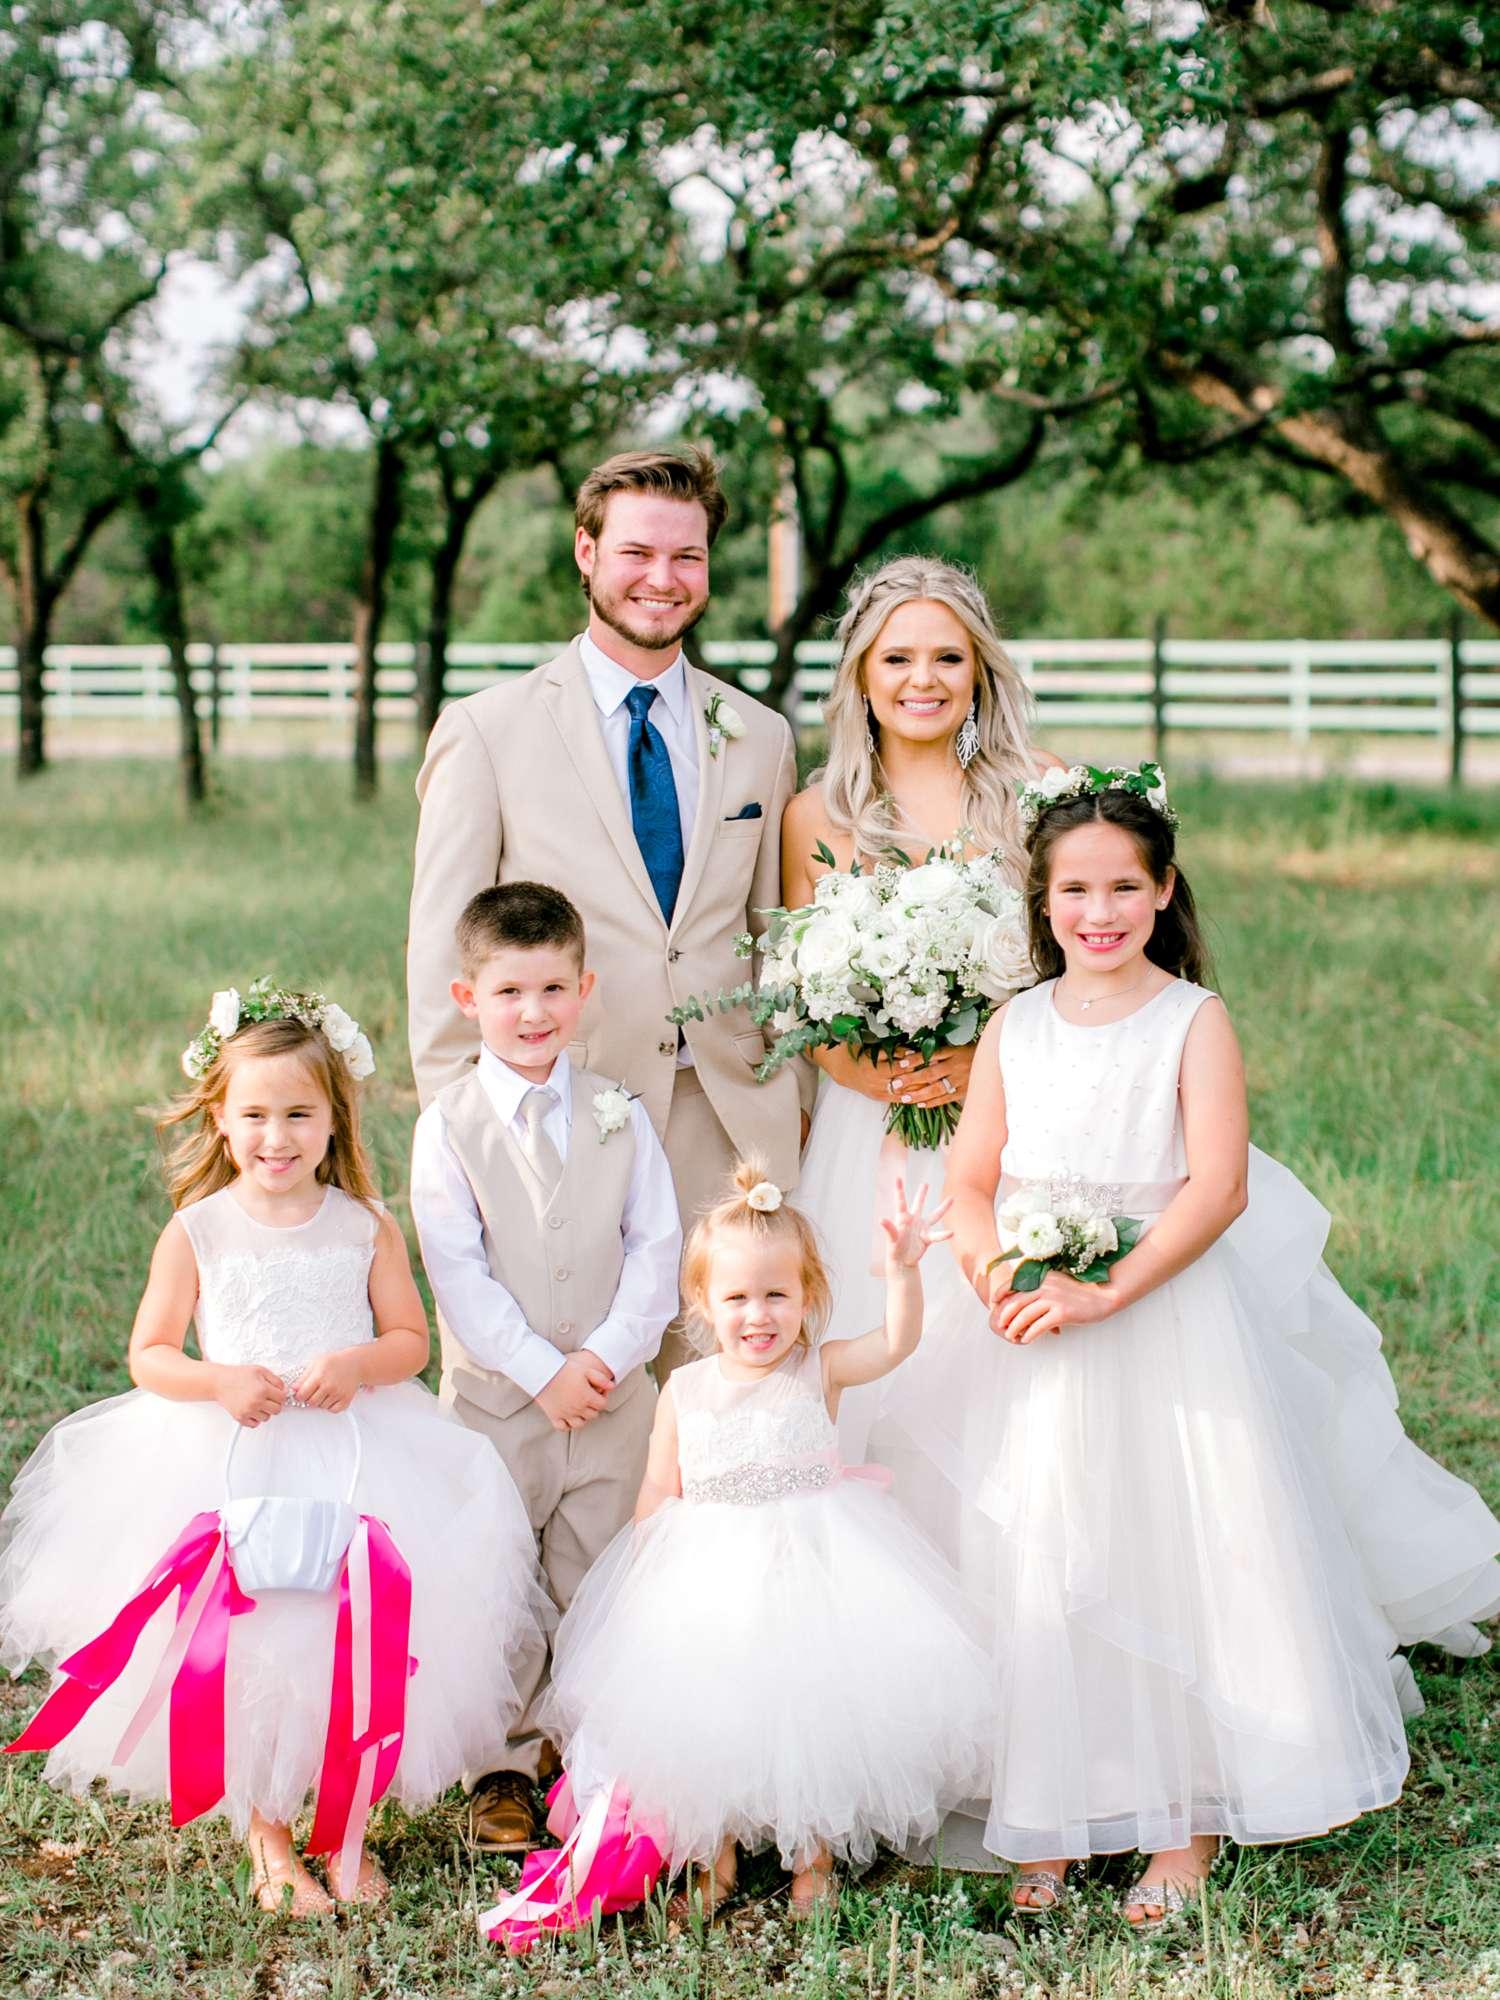 HAYLEE+JUSTIN+GREGORY+HERITAGE_HAUS_AUSTIN_TEXAS_WEDDING_0092.jpg